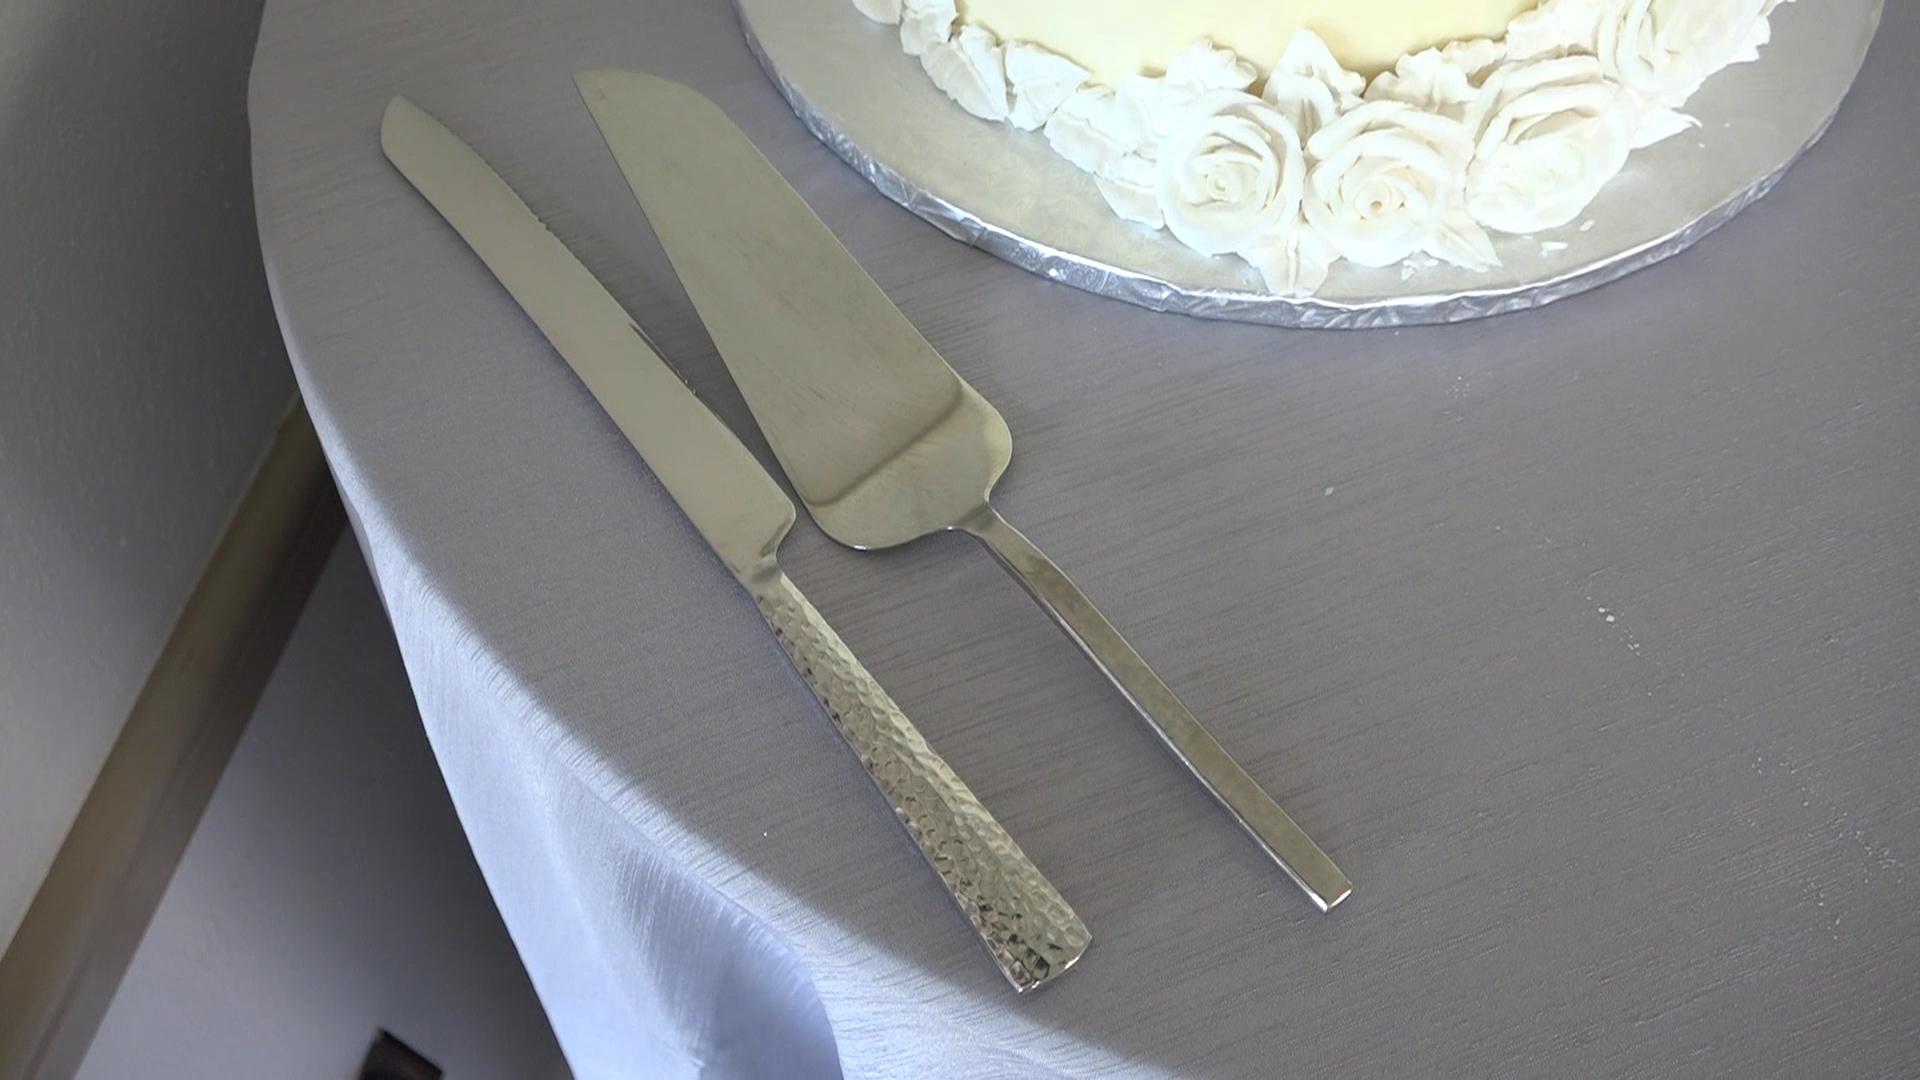 Chris And Todd 25th Anniversary Wedding Renewal Cake Knives Star City Creations